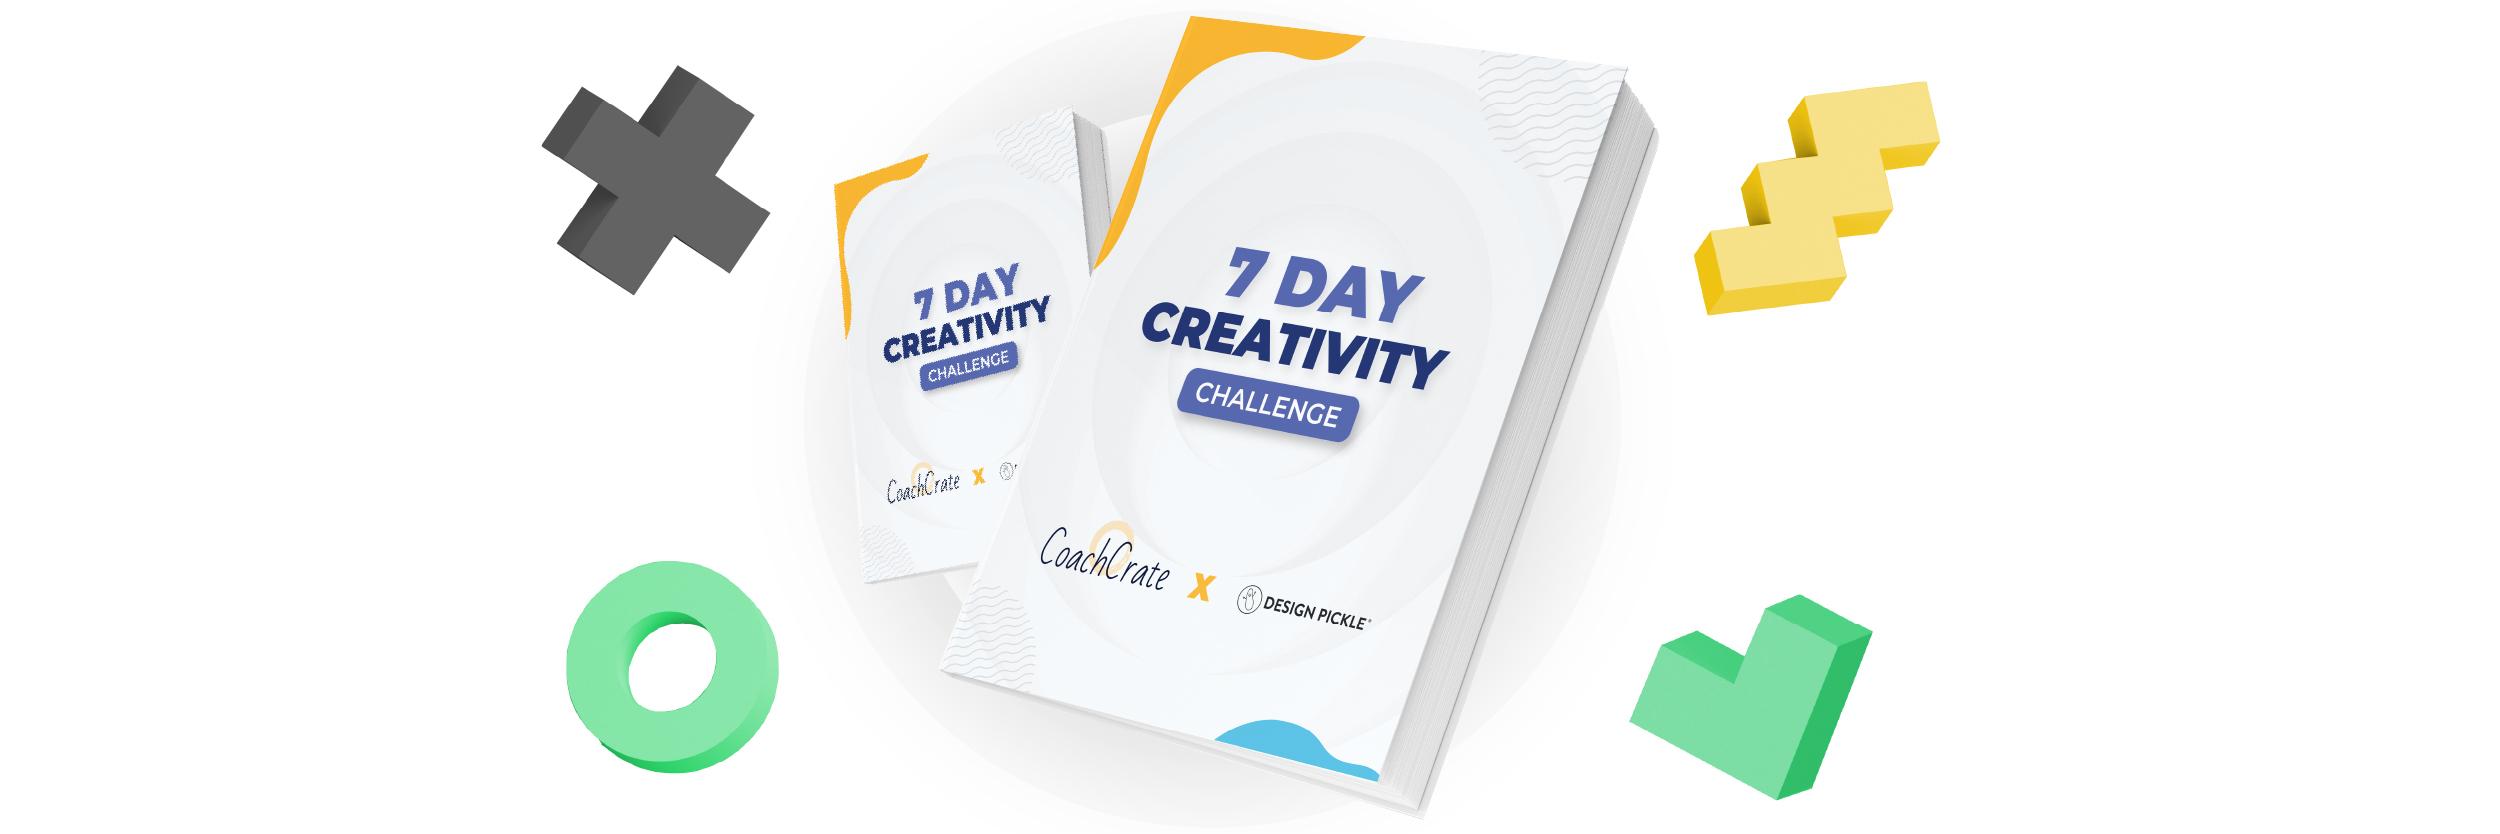 7 Day Creativity Challenge